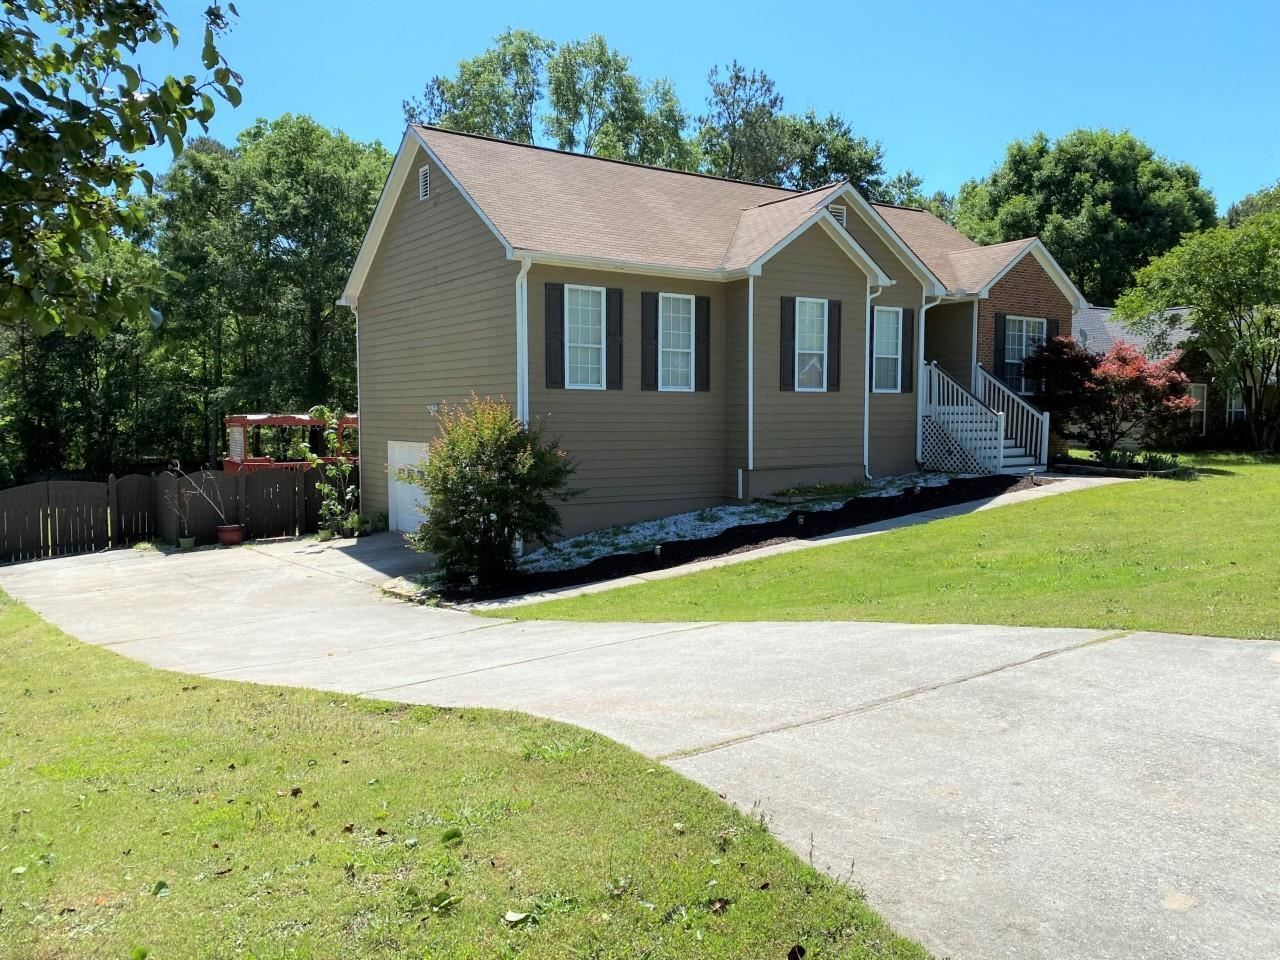 64 Leighs Grove Way, Grayson, GA 30017 - #: 8978051